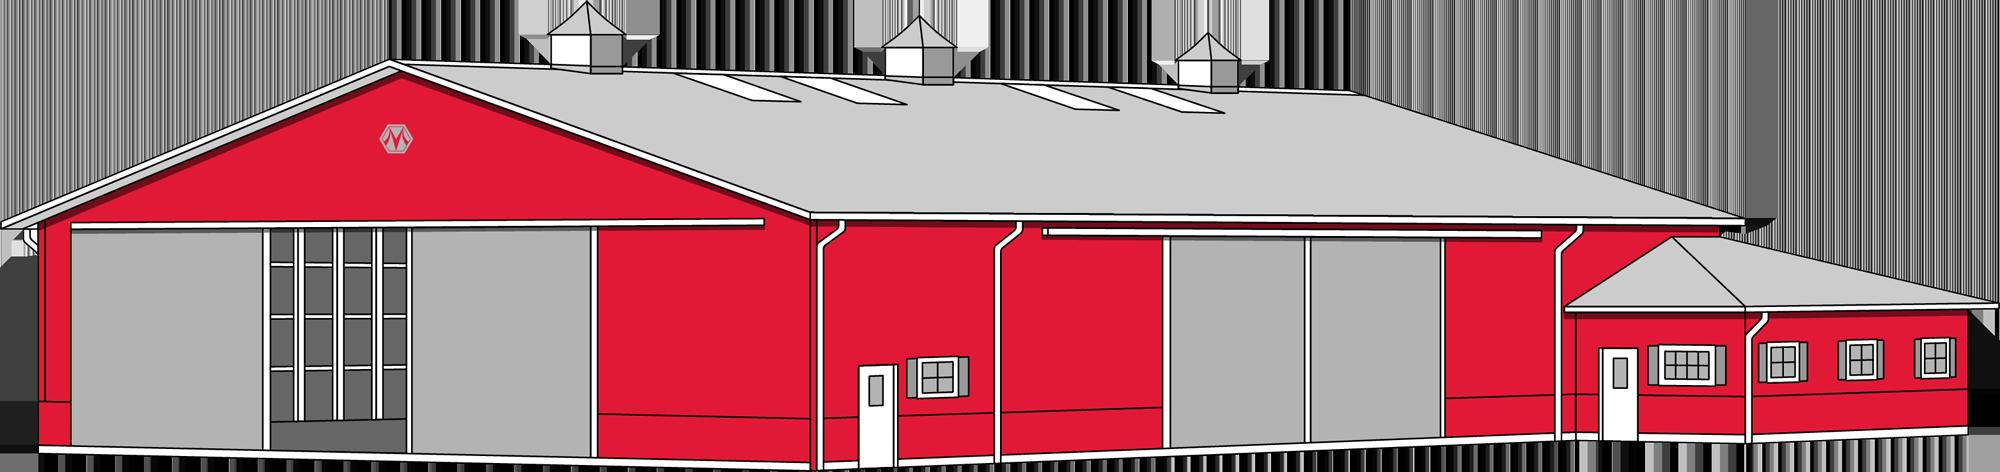 Repairs morton buildings steel. Clipart barn pole barn